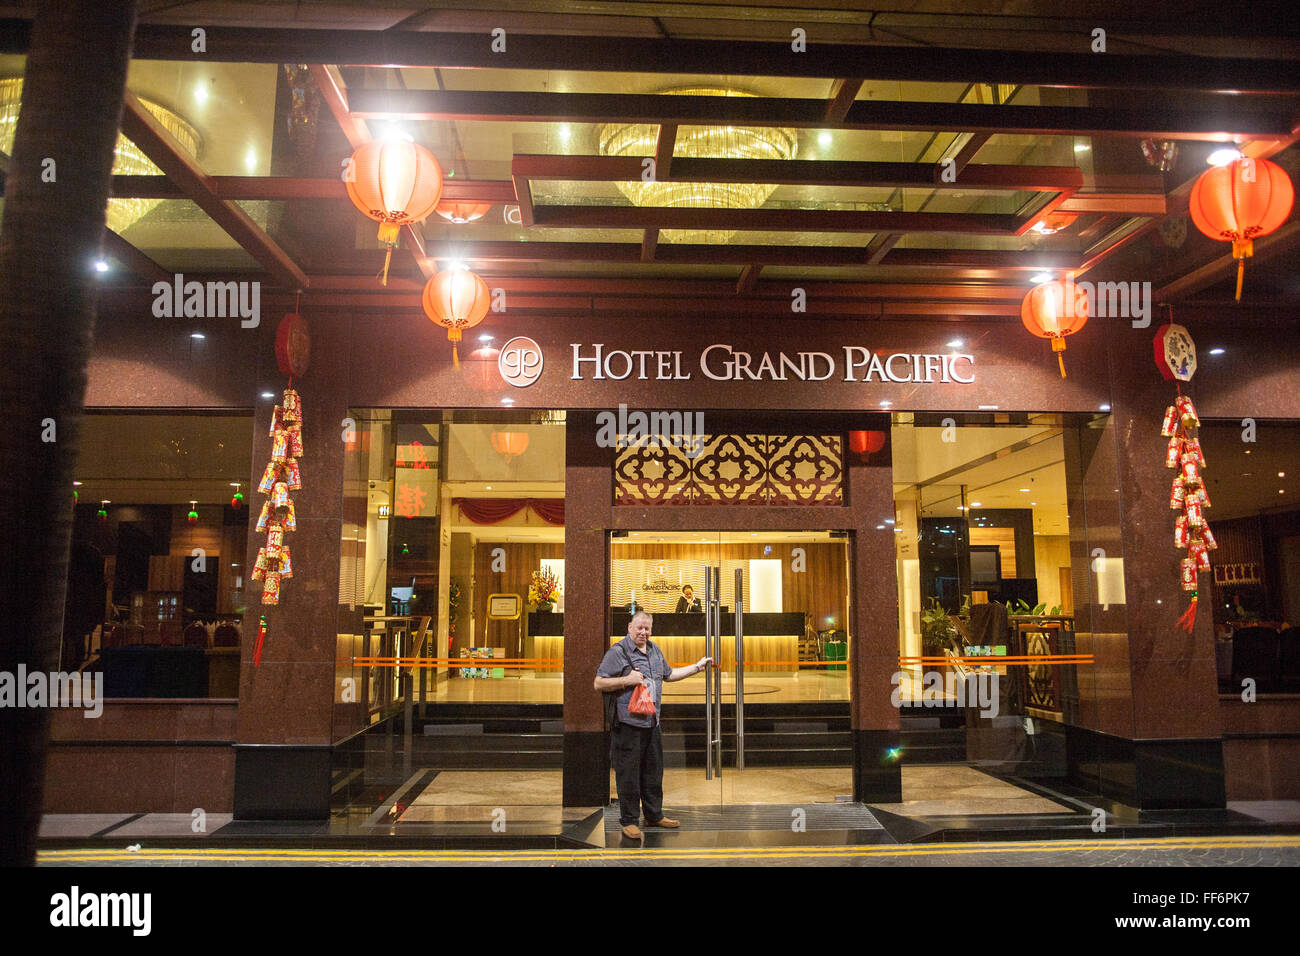 British Tourist At Entrance To Hotel Grand Pacific Hotel In Centre